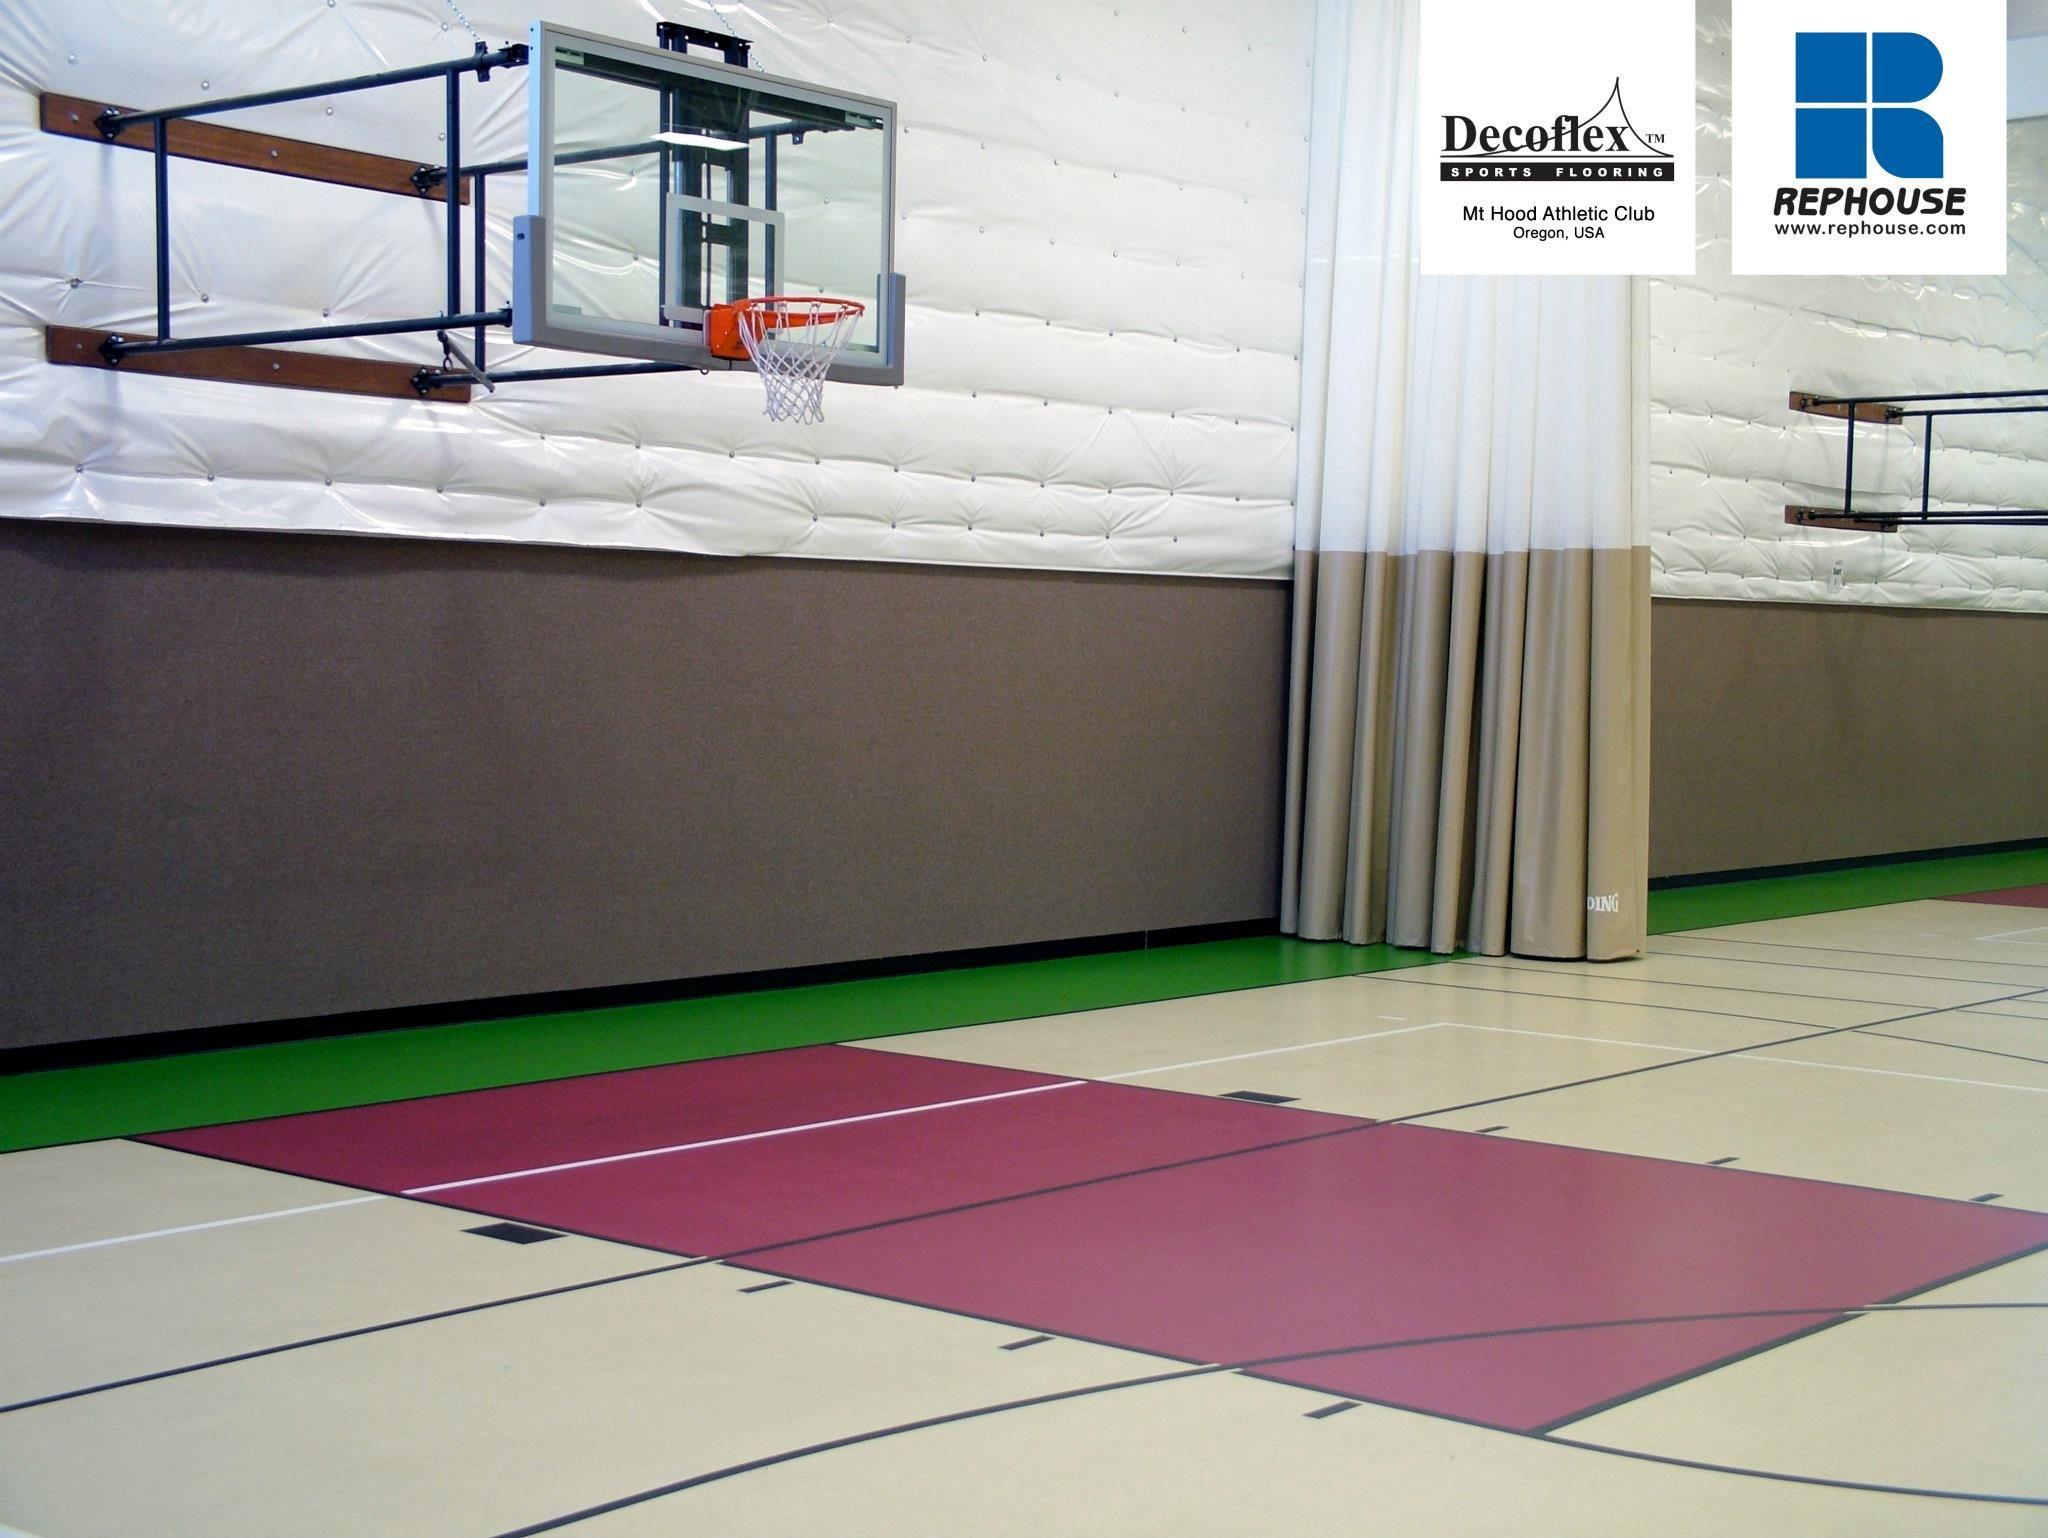 Decoflex Universal Seamless Polyurethane Indoor Sports Flooring Mt Hood Athletic Club Oregon Usa Indoor Sports Sports Athletic Clubs